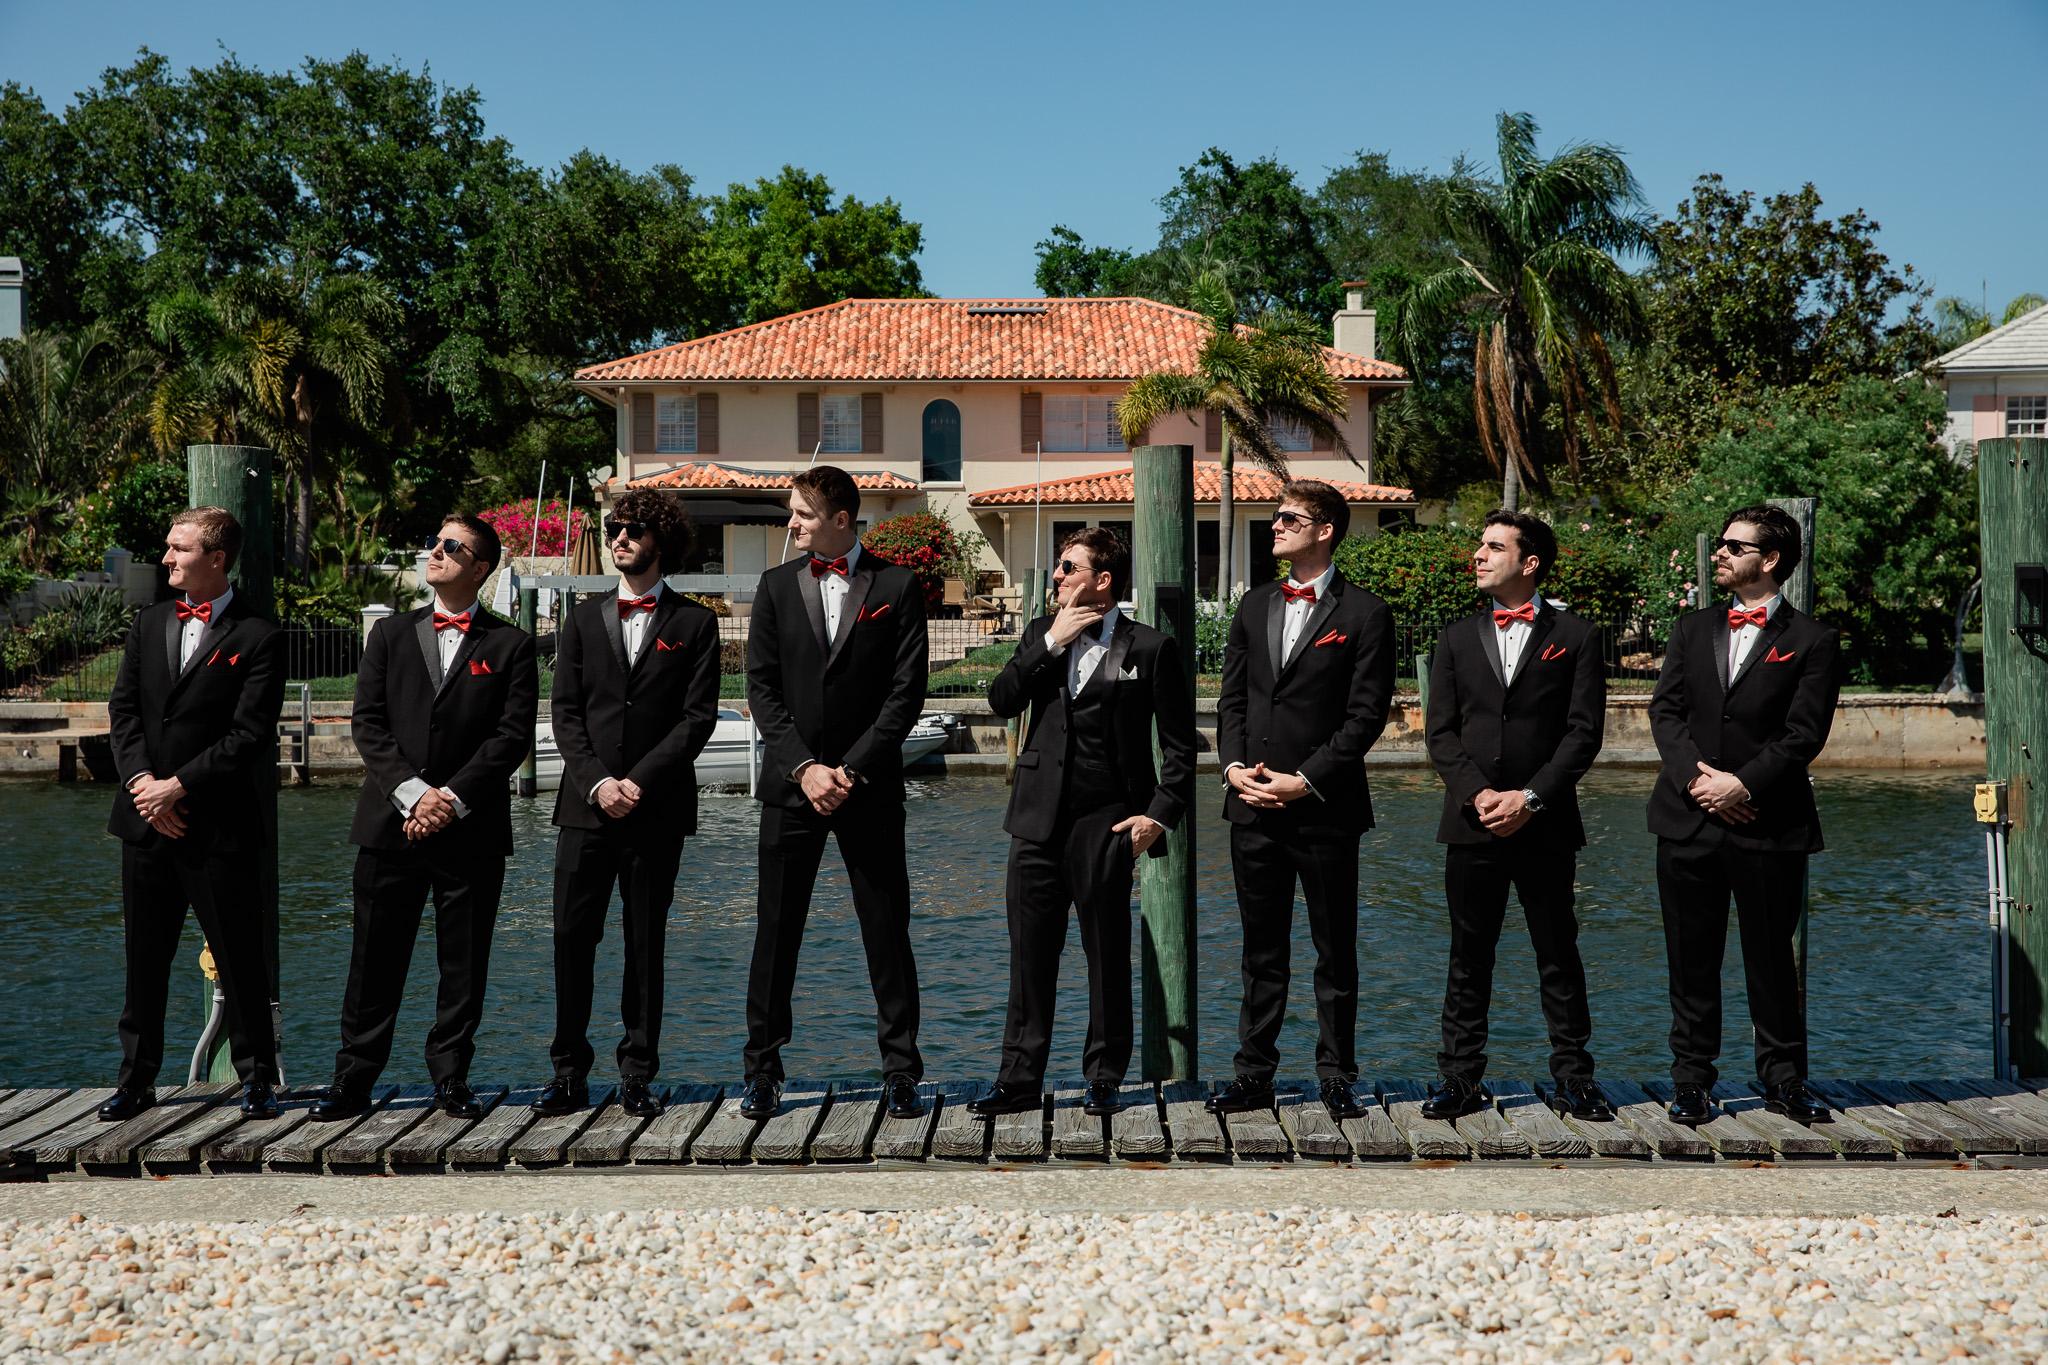 TAMPA_WEDDING_PHOTOGRAPHER_MPMZ_TJP40369_0028.jpg